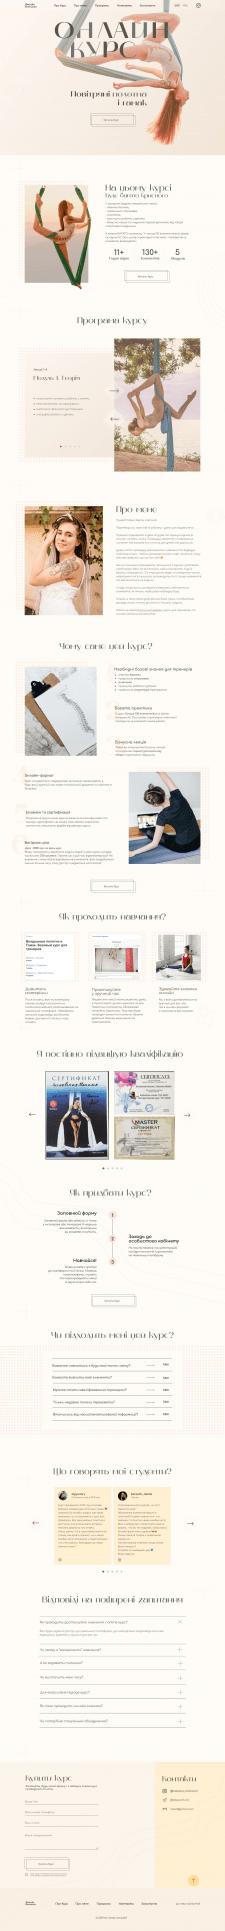 онлайн курс - дизайн лендинга